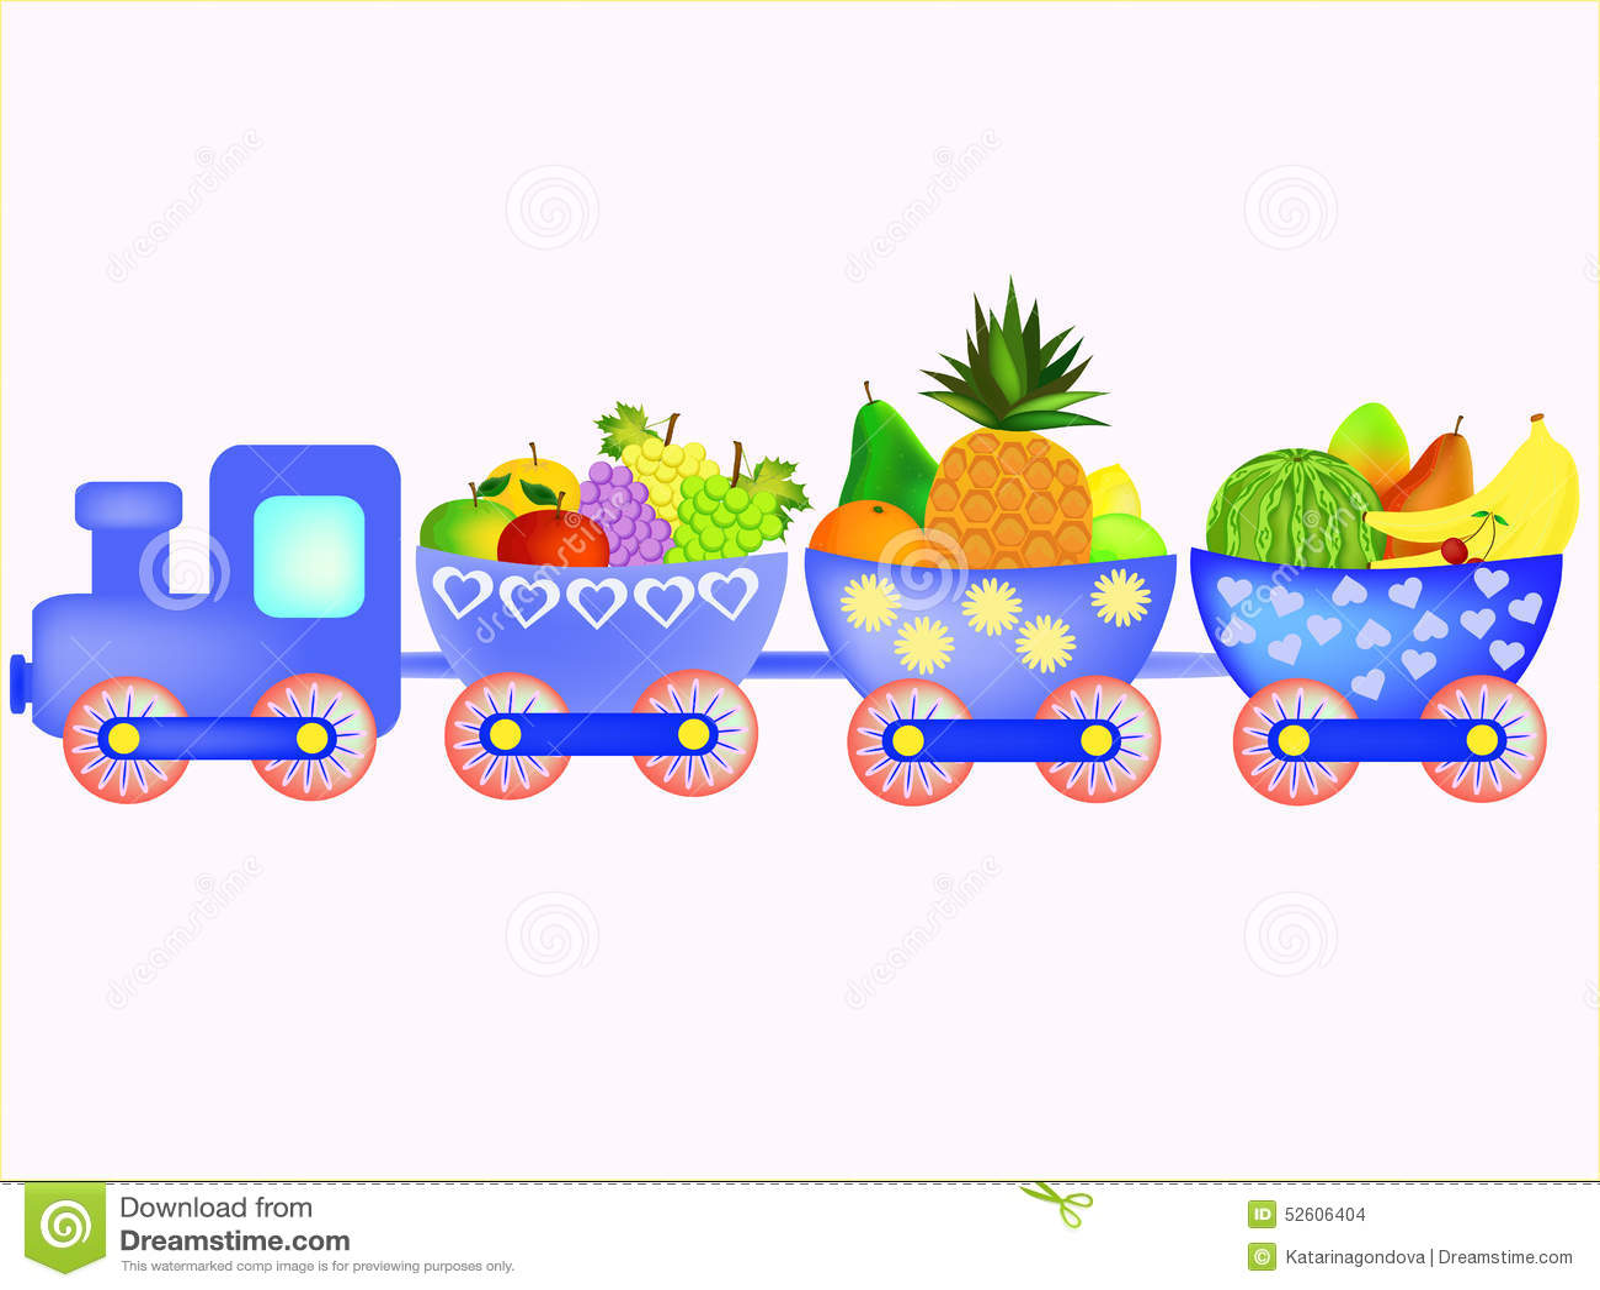 train with cartoon fruit stock illustration image 52606404